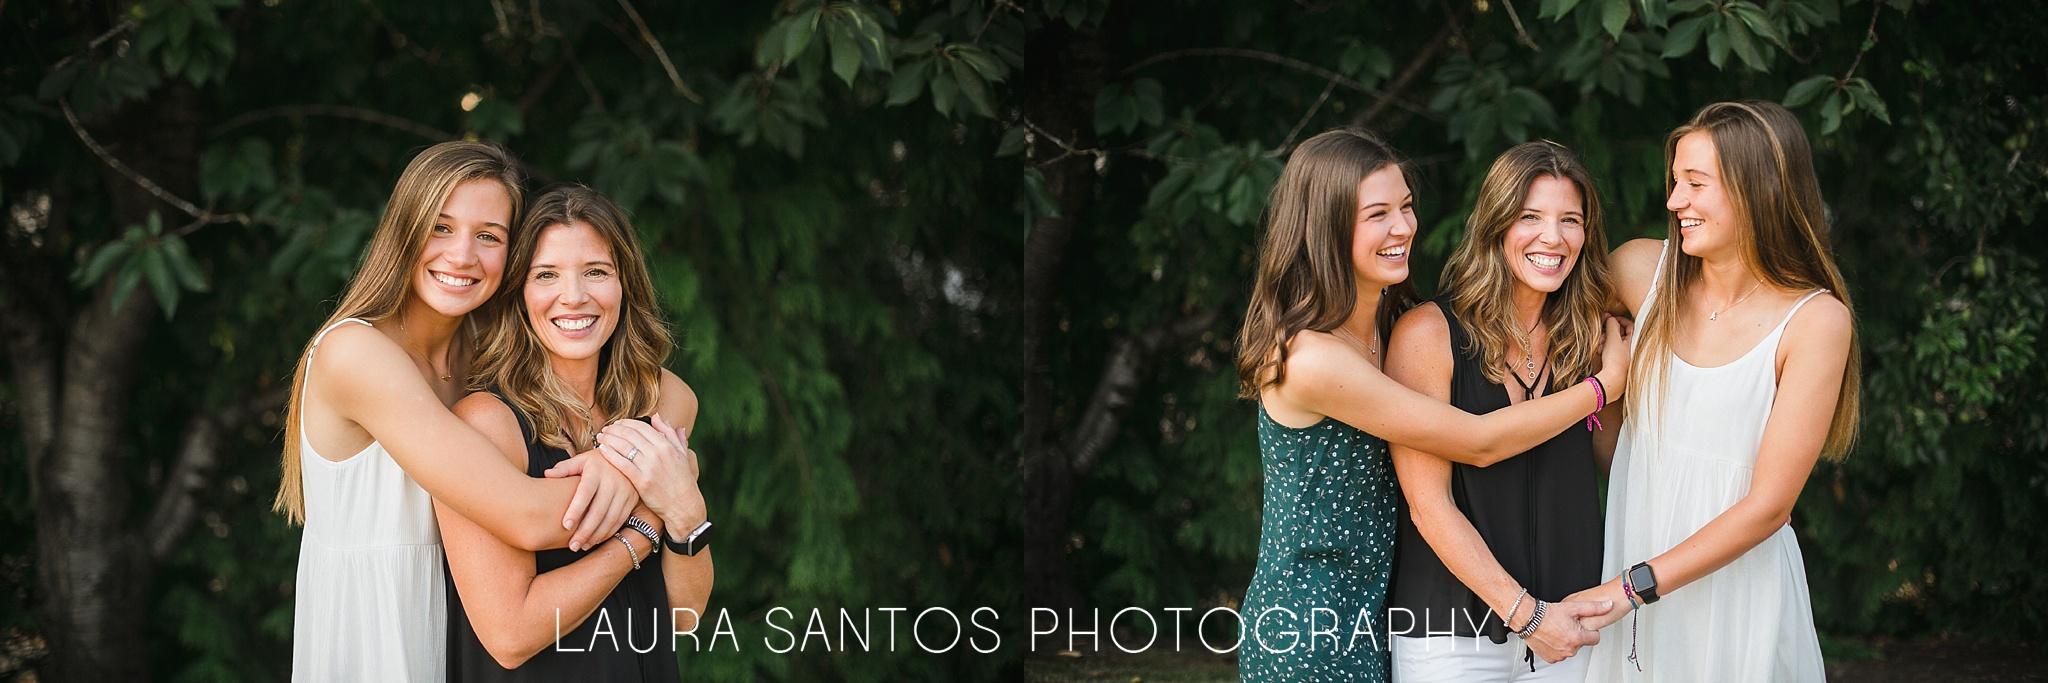 Laura Santos Photography Portland Oregon Family Photographer_0254.jpg